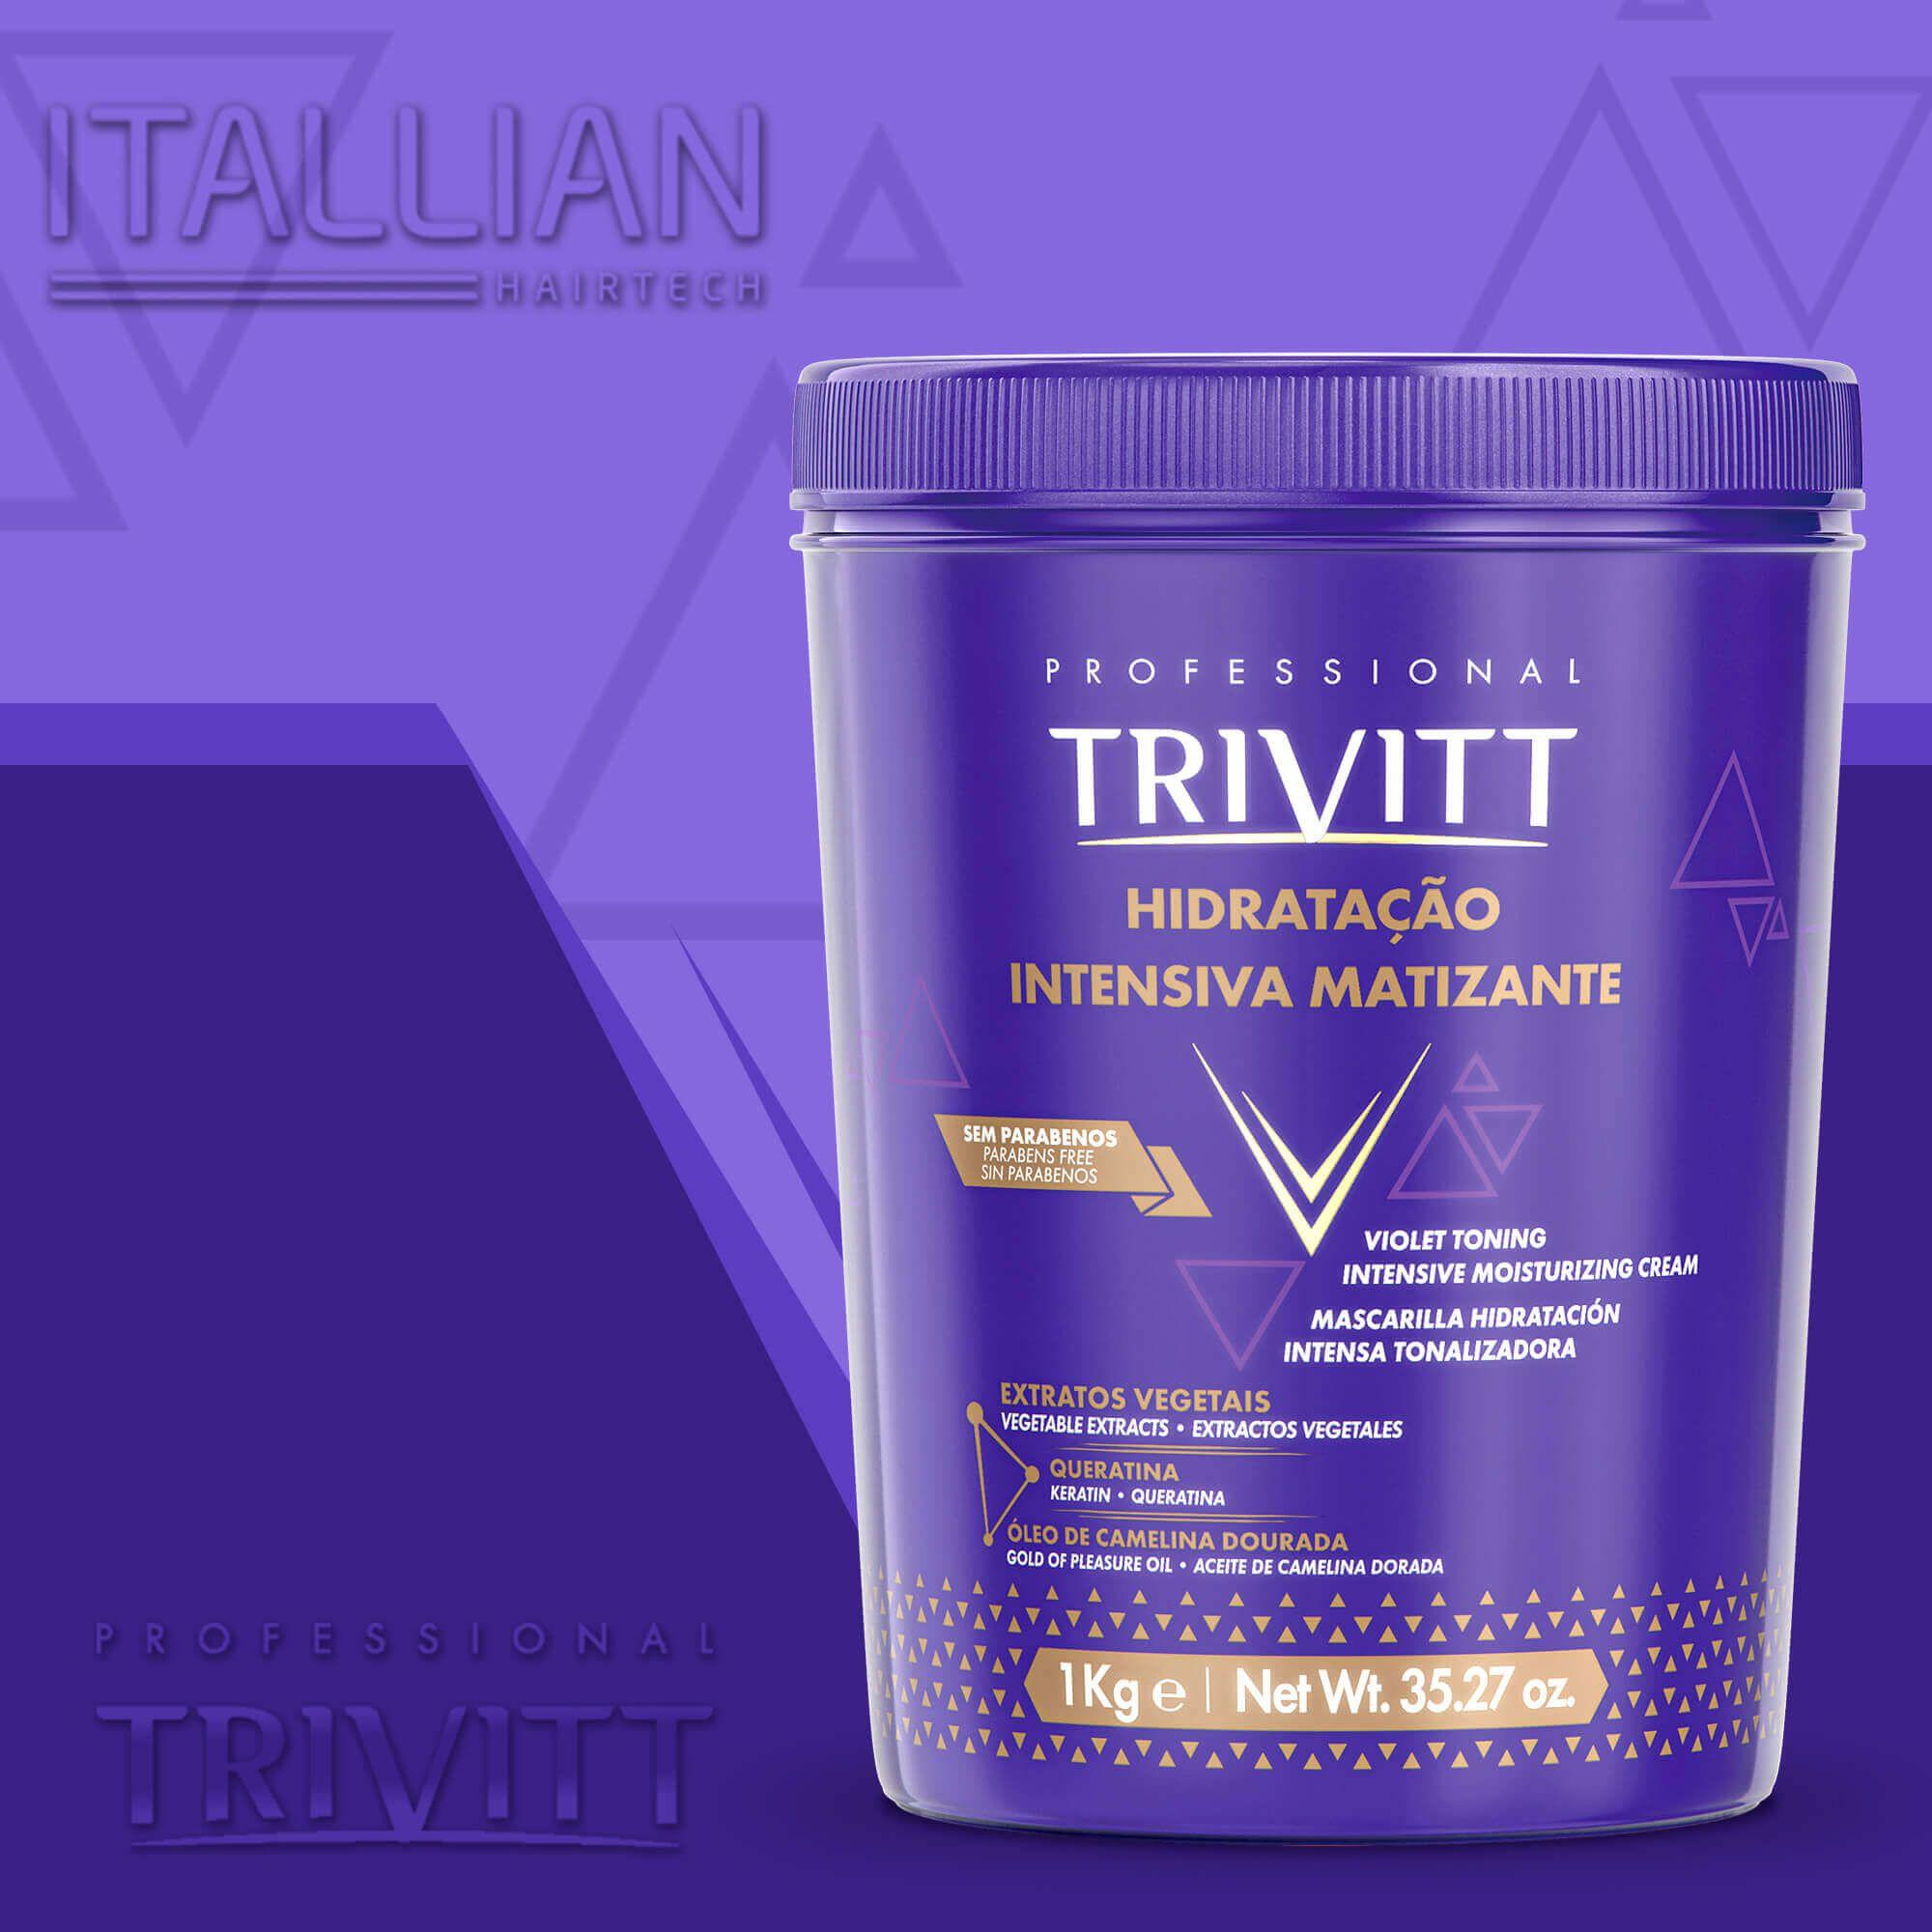 Hidratação Intensiva Matizante Itallian Trivitt - 1 Kg